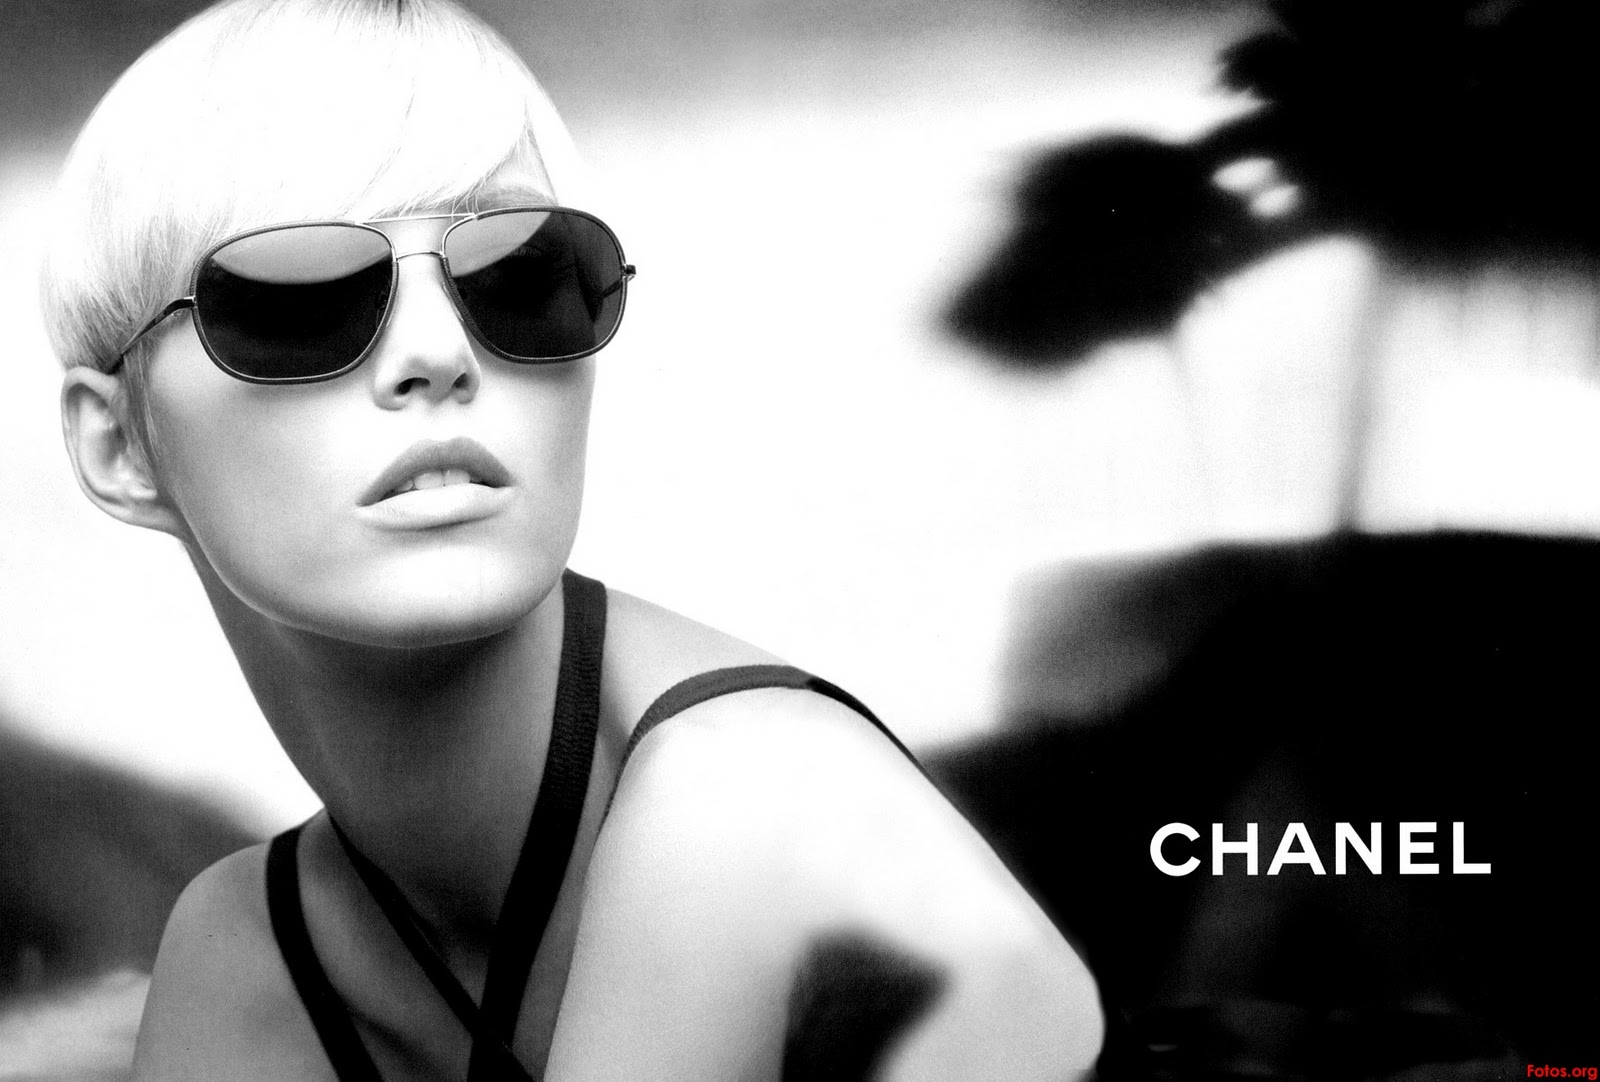 http://2.bp.blogspot.com/_hotmlN9cUXI/TRuRld1IdRI/AAAAAAAAALk/xTFWsFtQ1DM/s1600/anja_rubik-chanel-02-eyewear-1.jpg